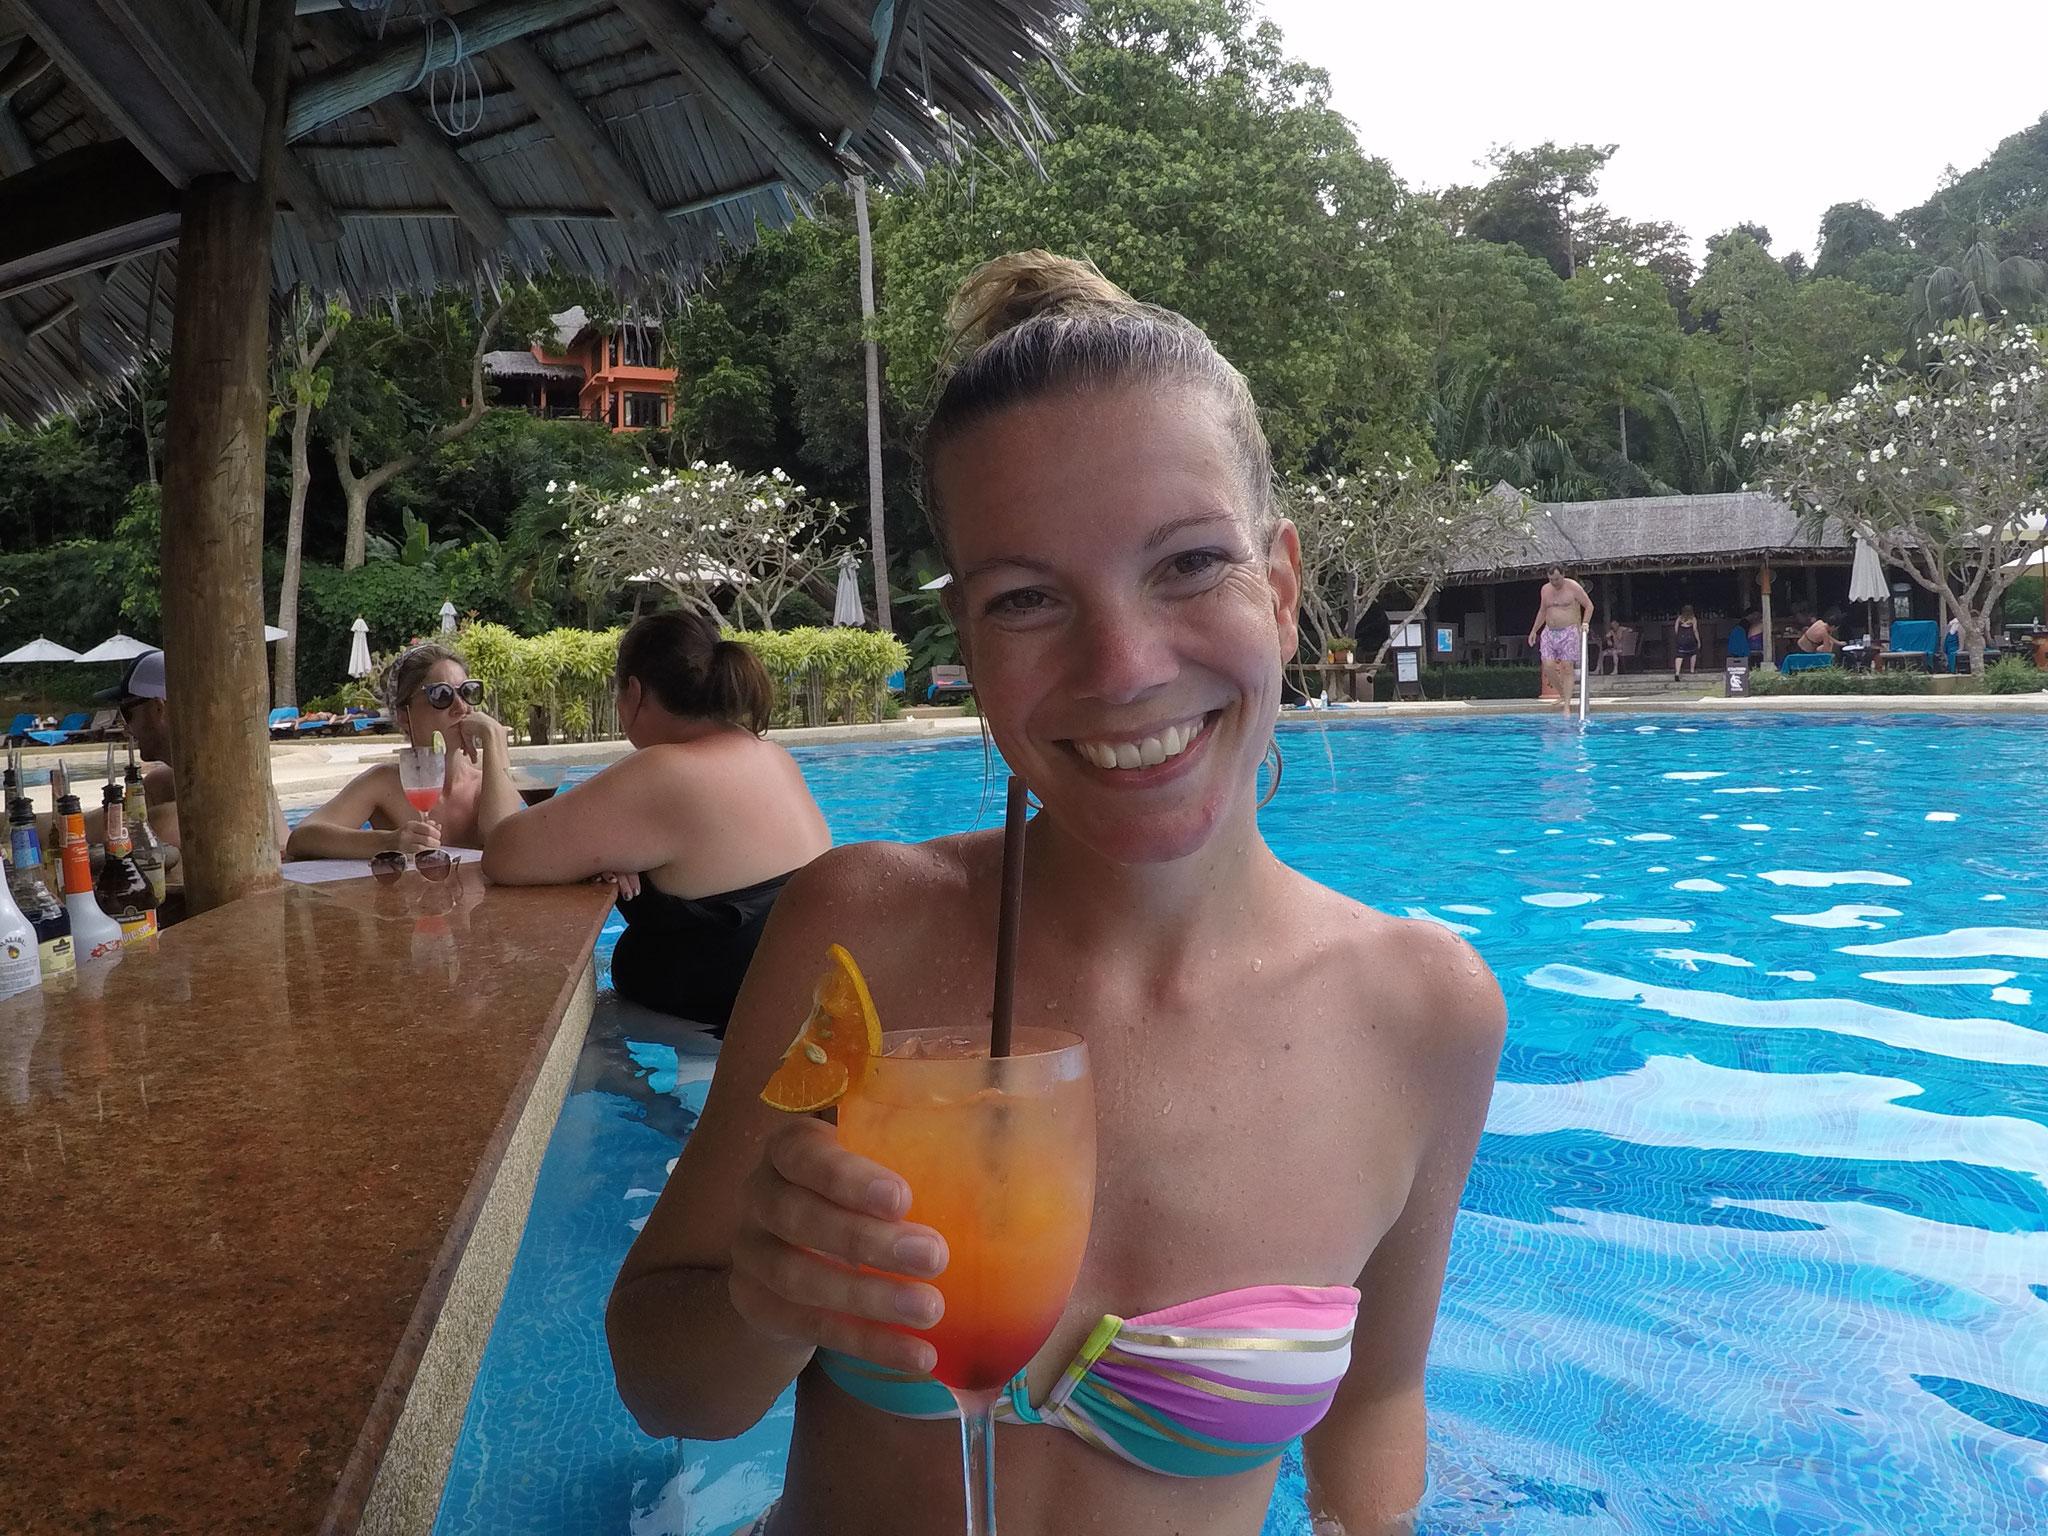 Cocktails im Pool genießen